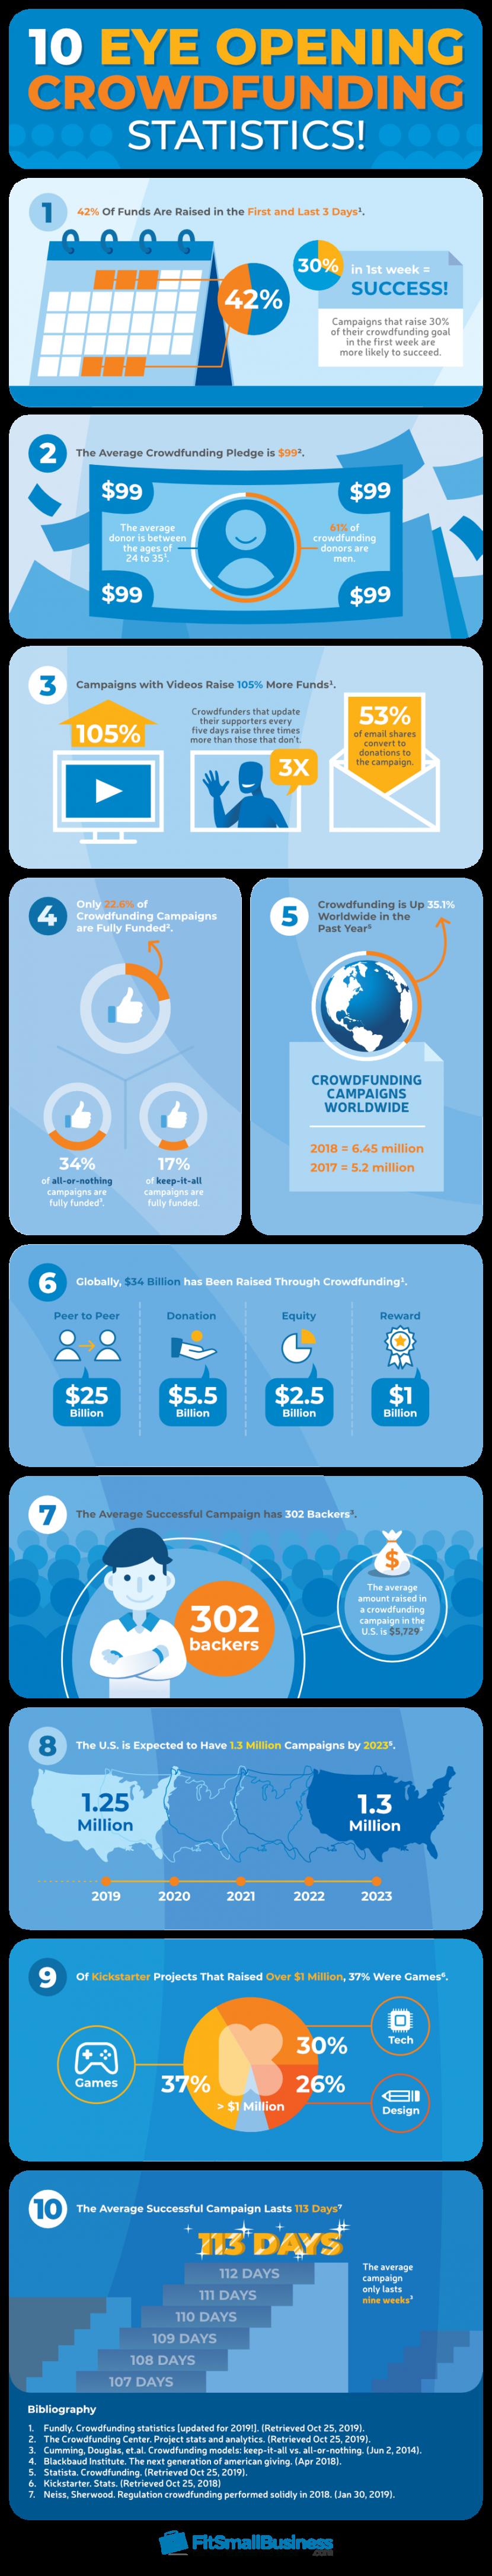 10 Eye Opening Crowdfunding Statistics!